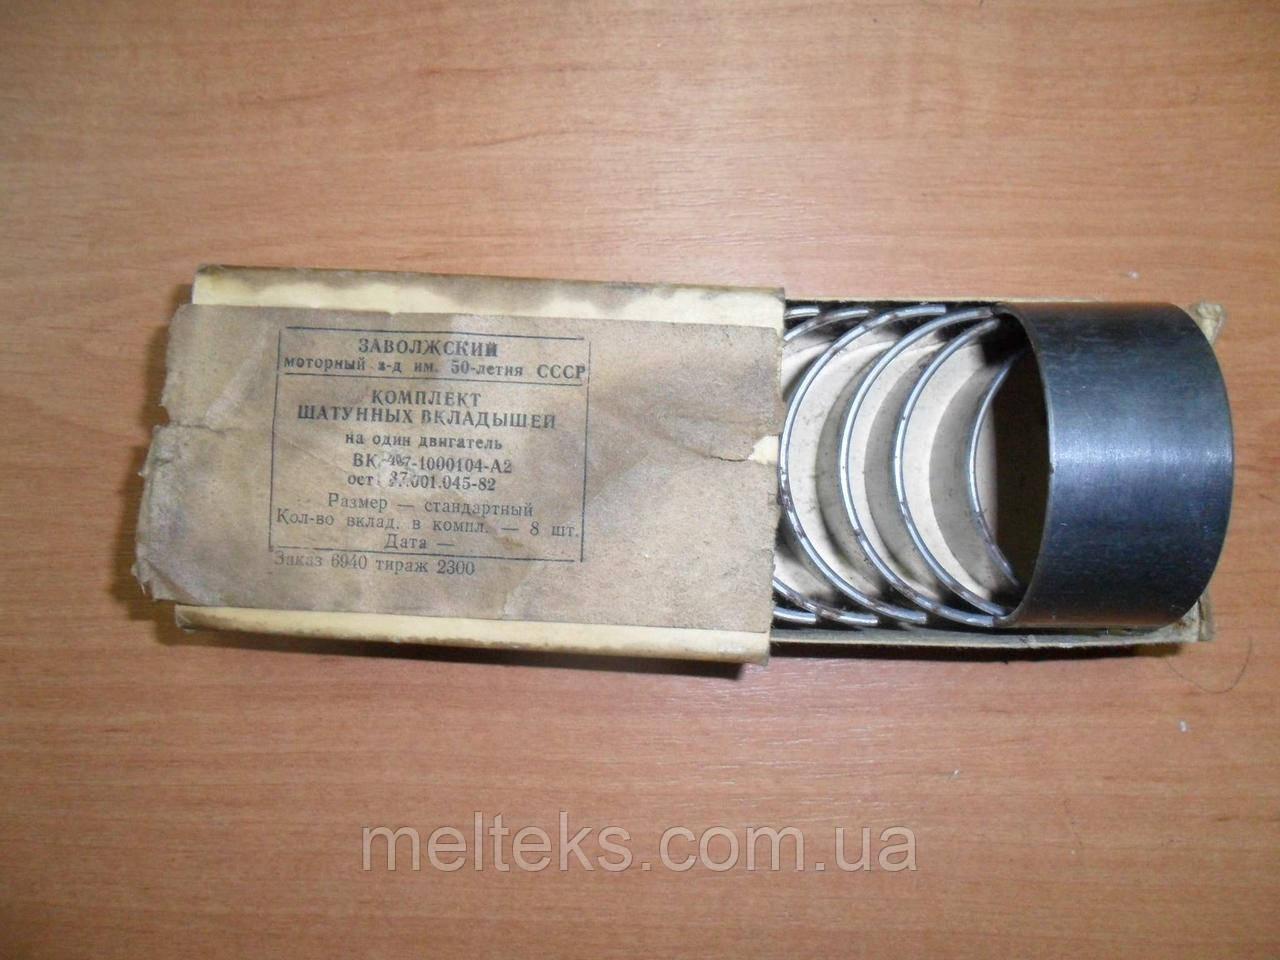 Вкладыши ВК-407 Москвич номинал